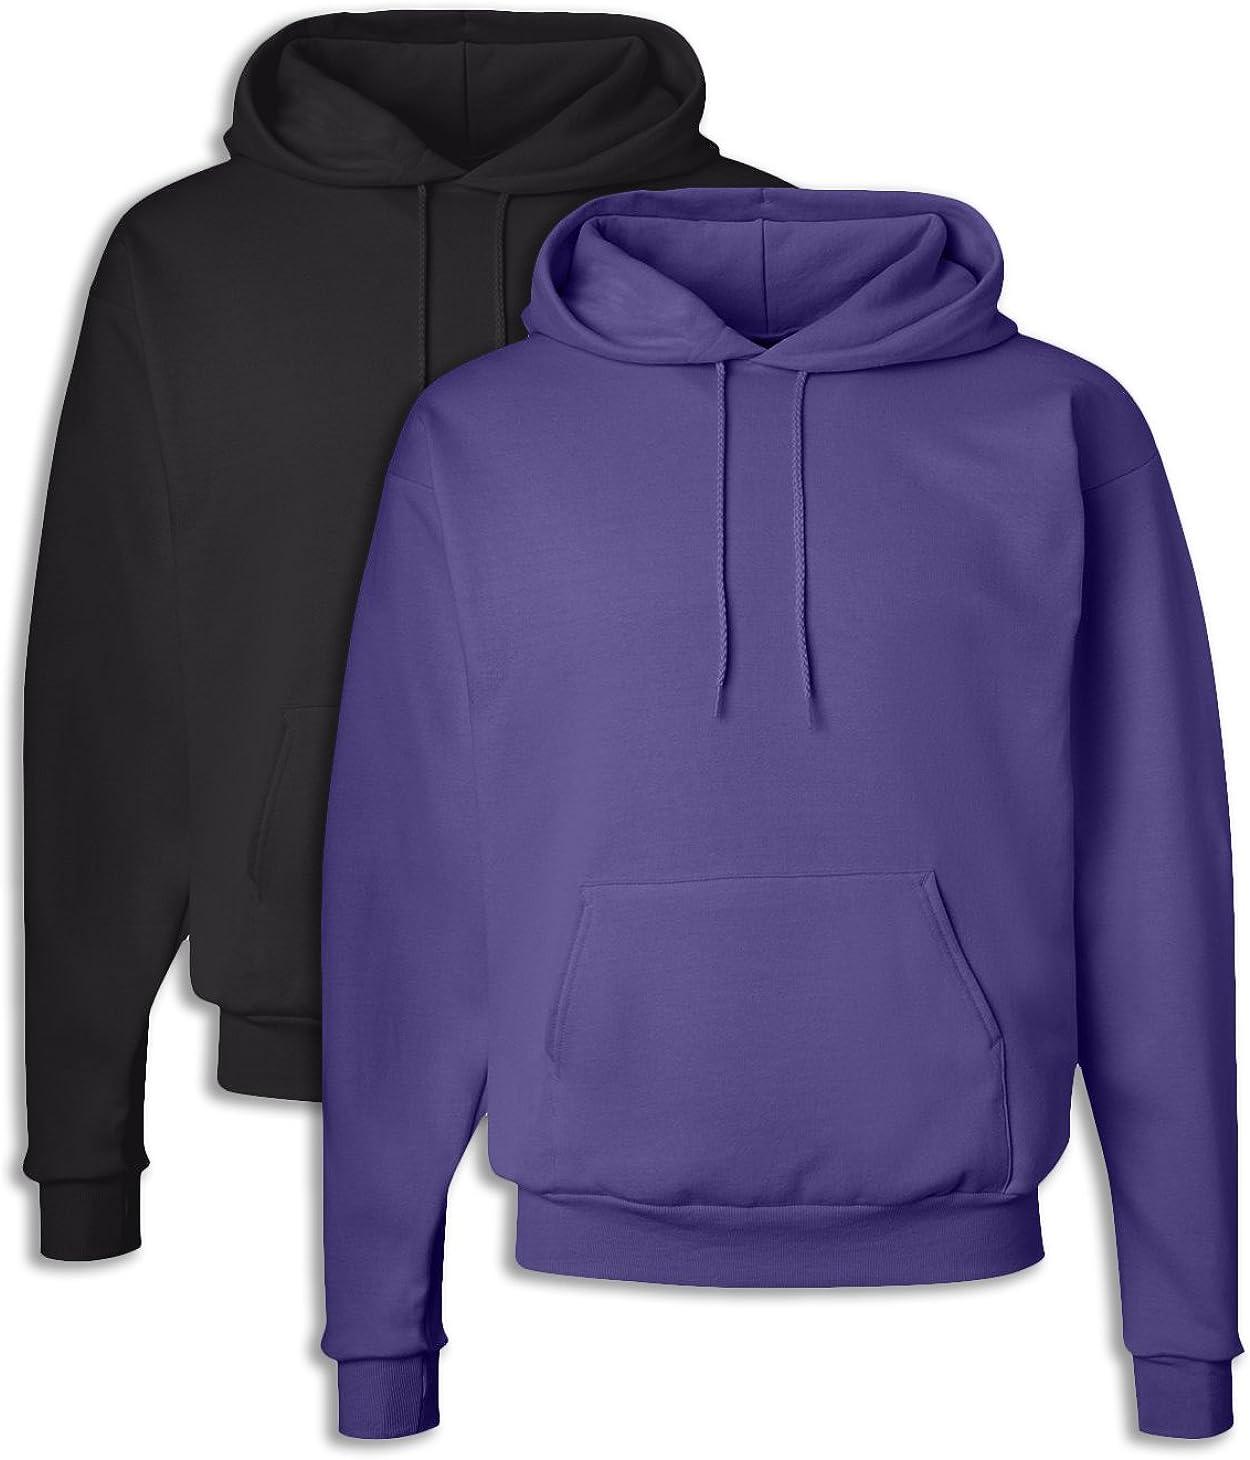 1 Purple Hanes P170 Mens EcoSmart Hooded Sweatshirt 2XL 1 Black